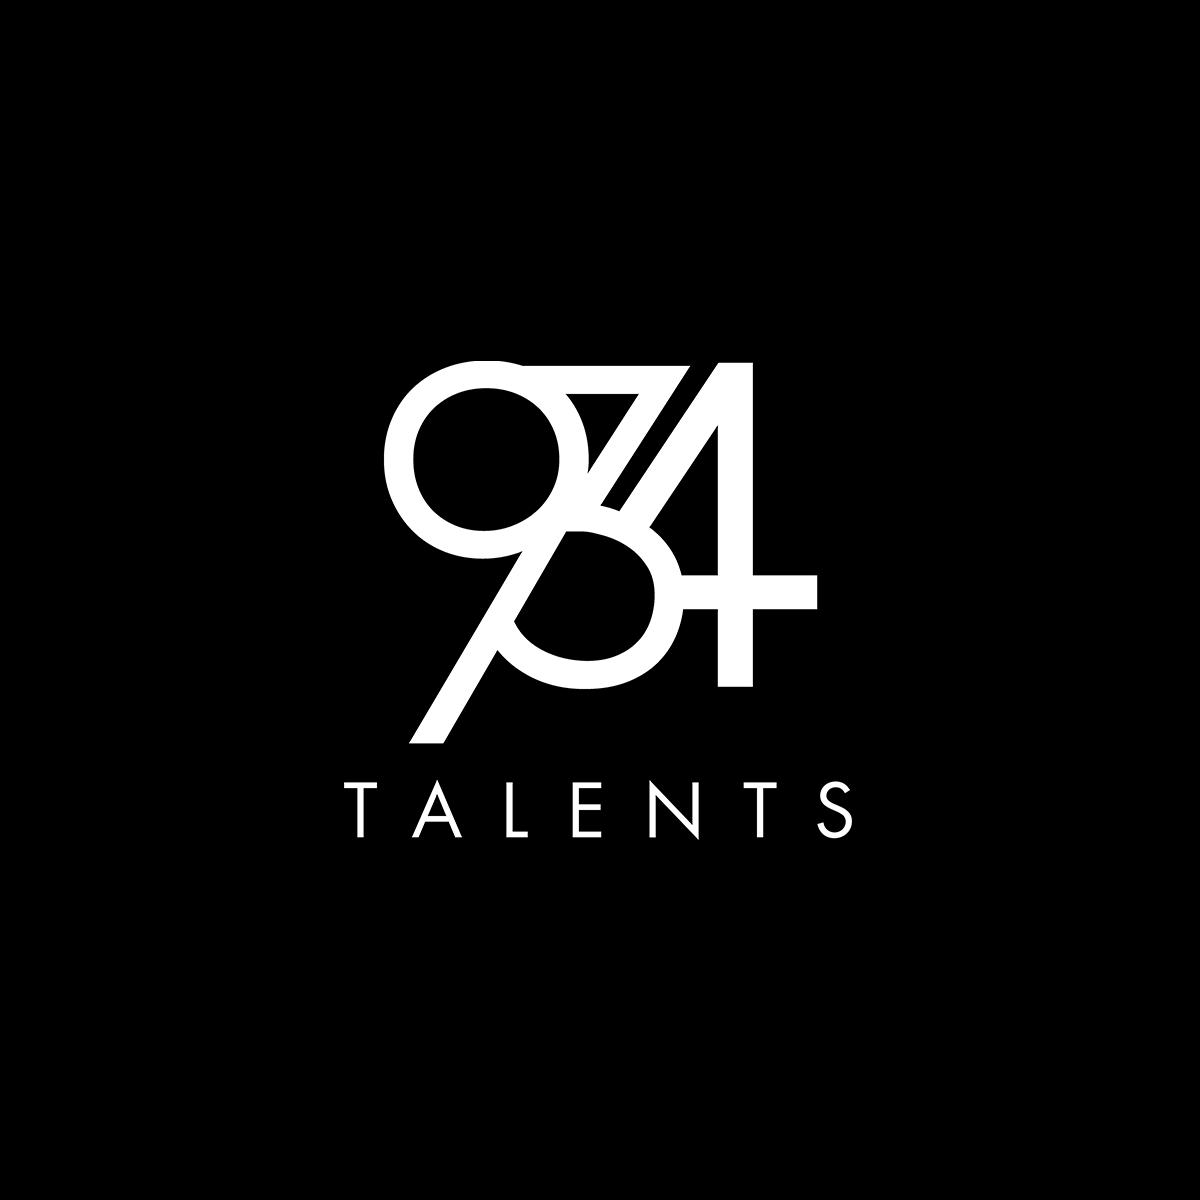 934 Talents (Long)